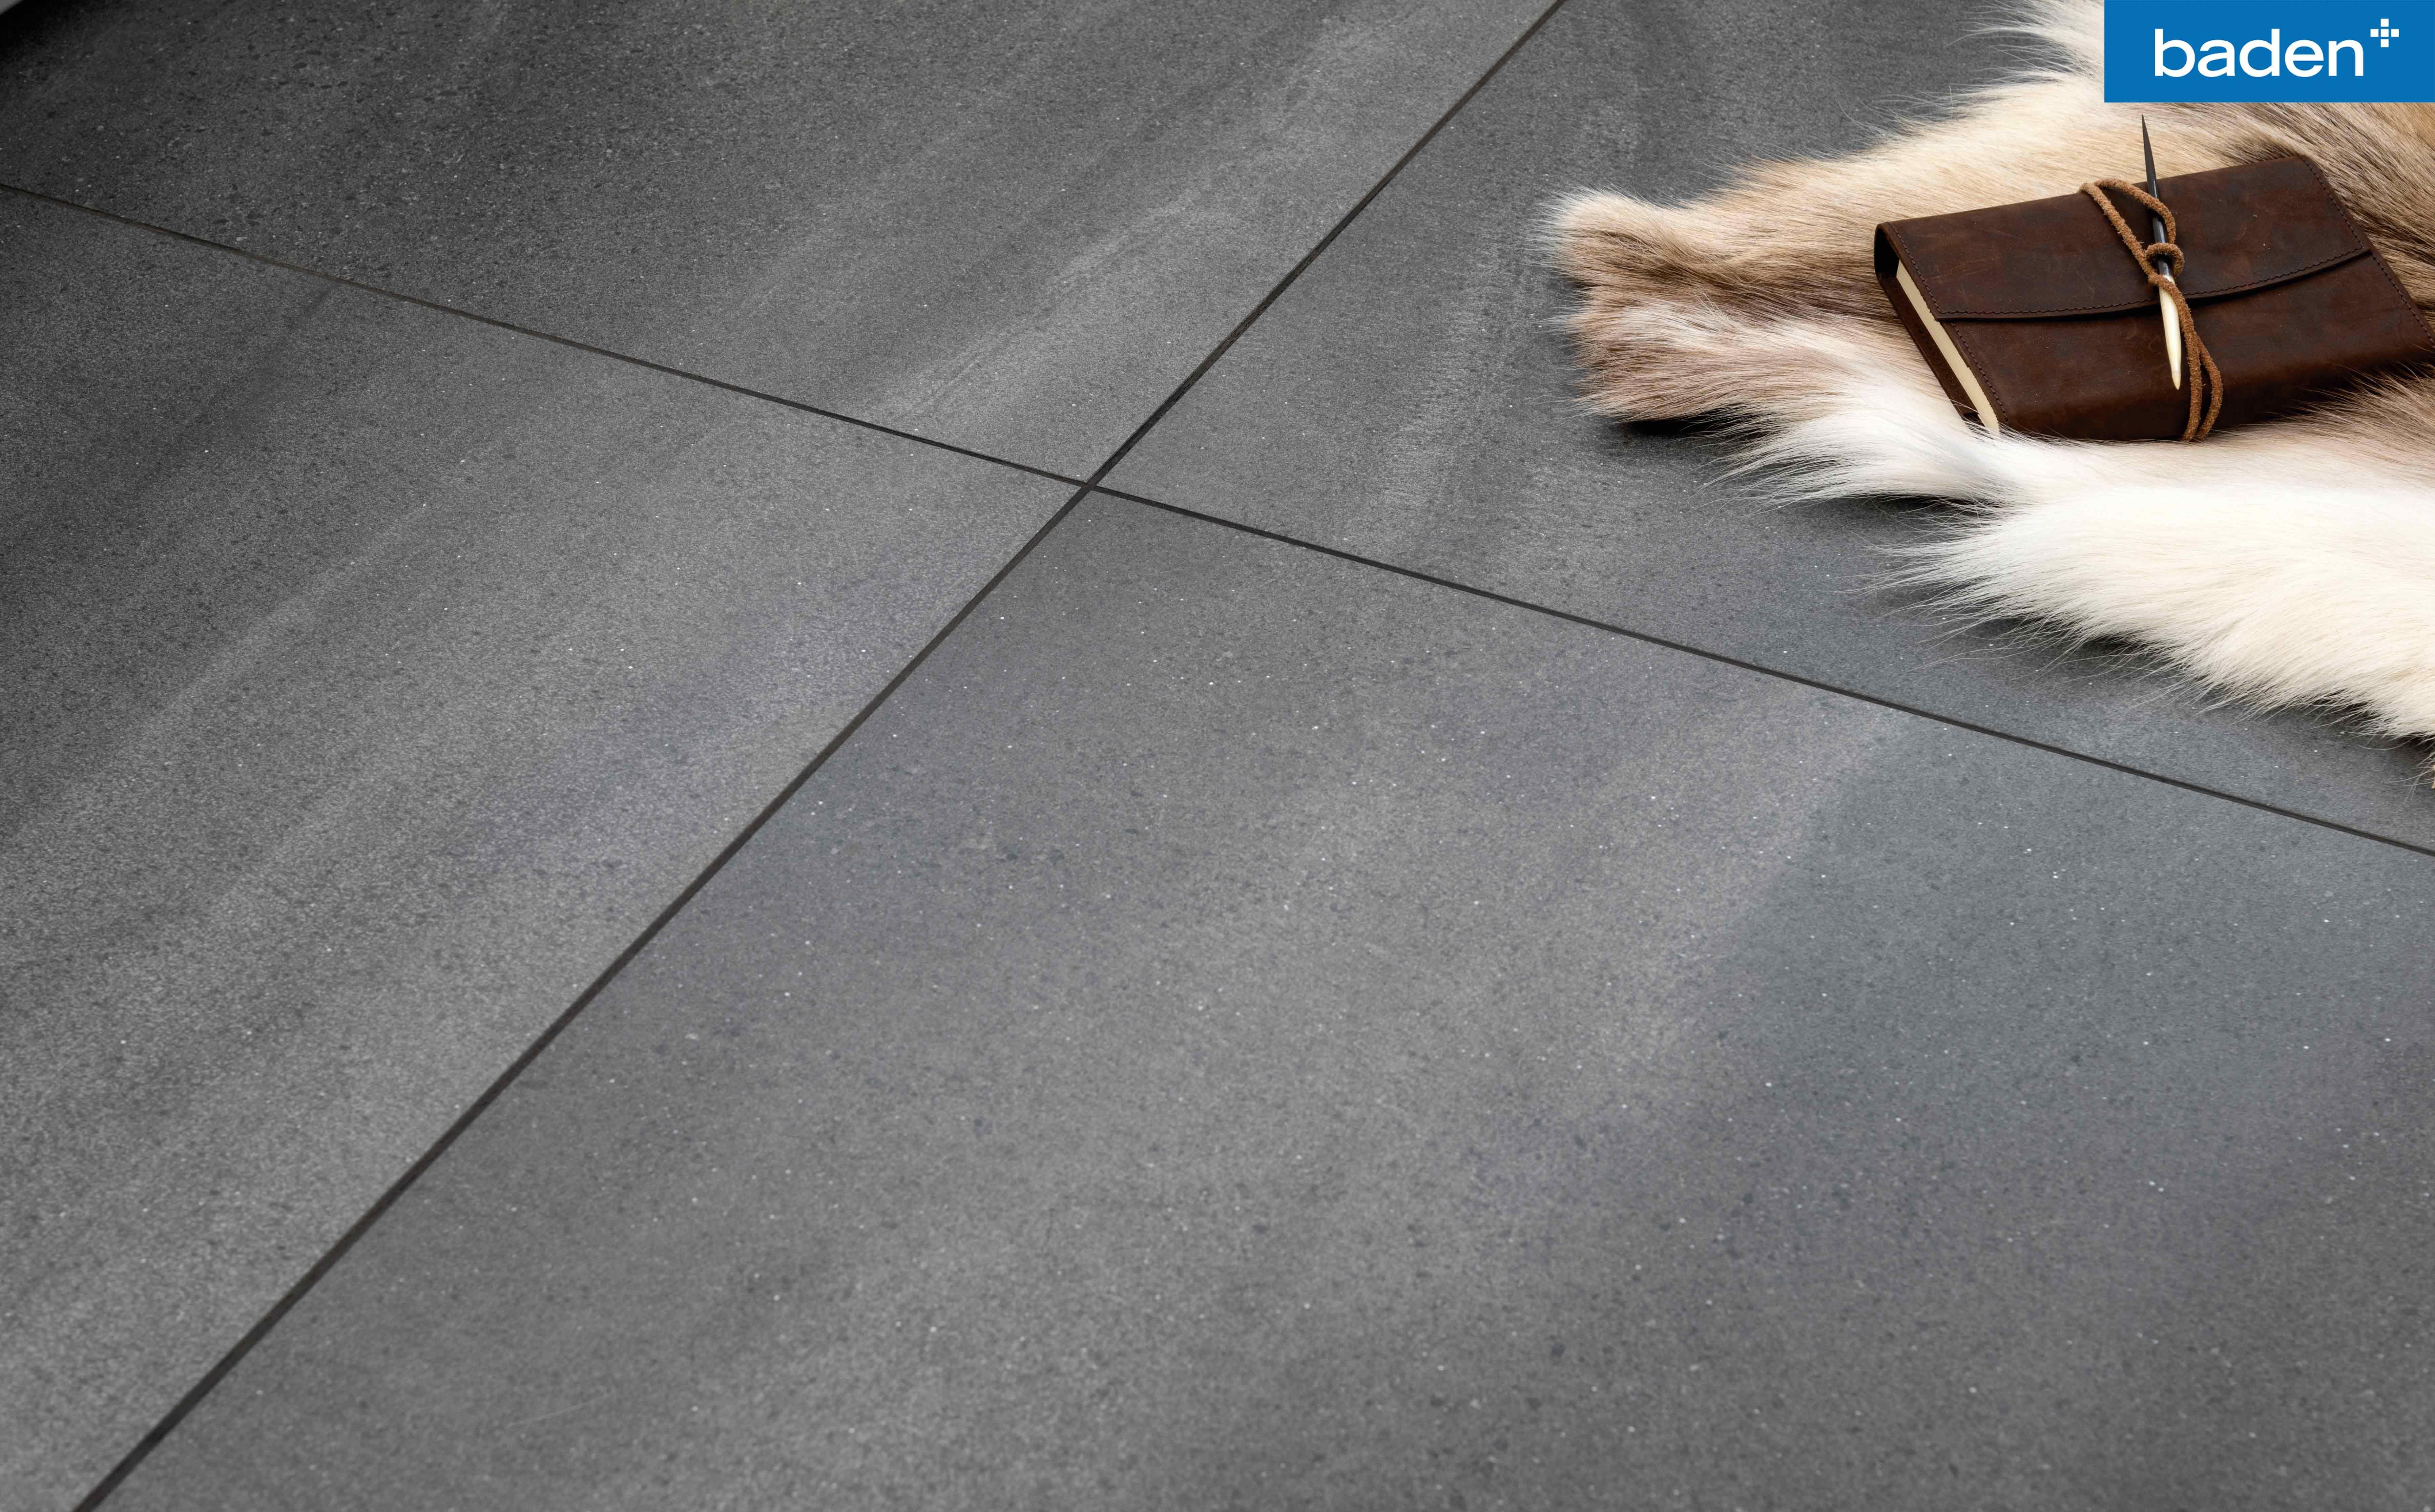 Badkamer Vloertegels Antislip : Zwart grijze tegels voor in de badkamer #badkamertegels #vloertegels